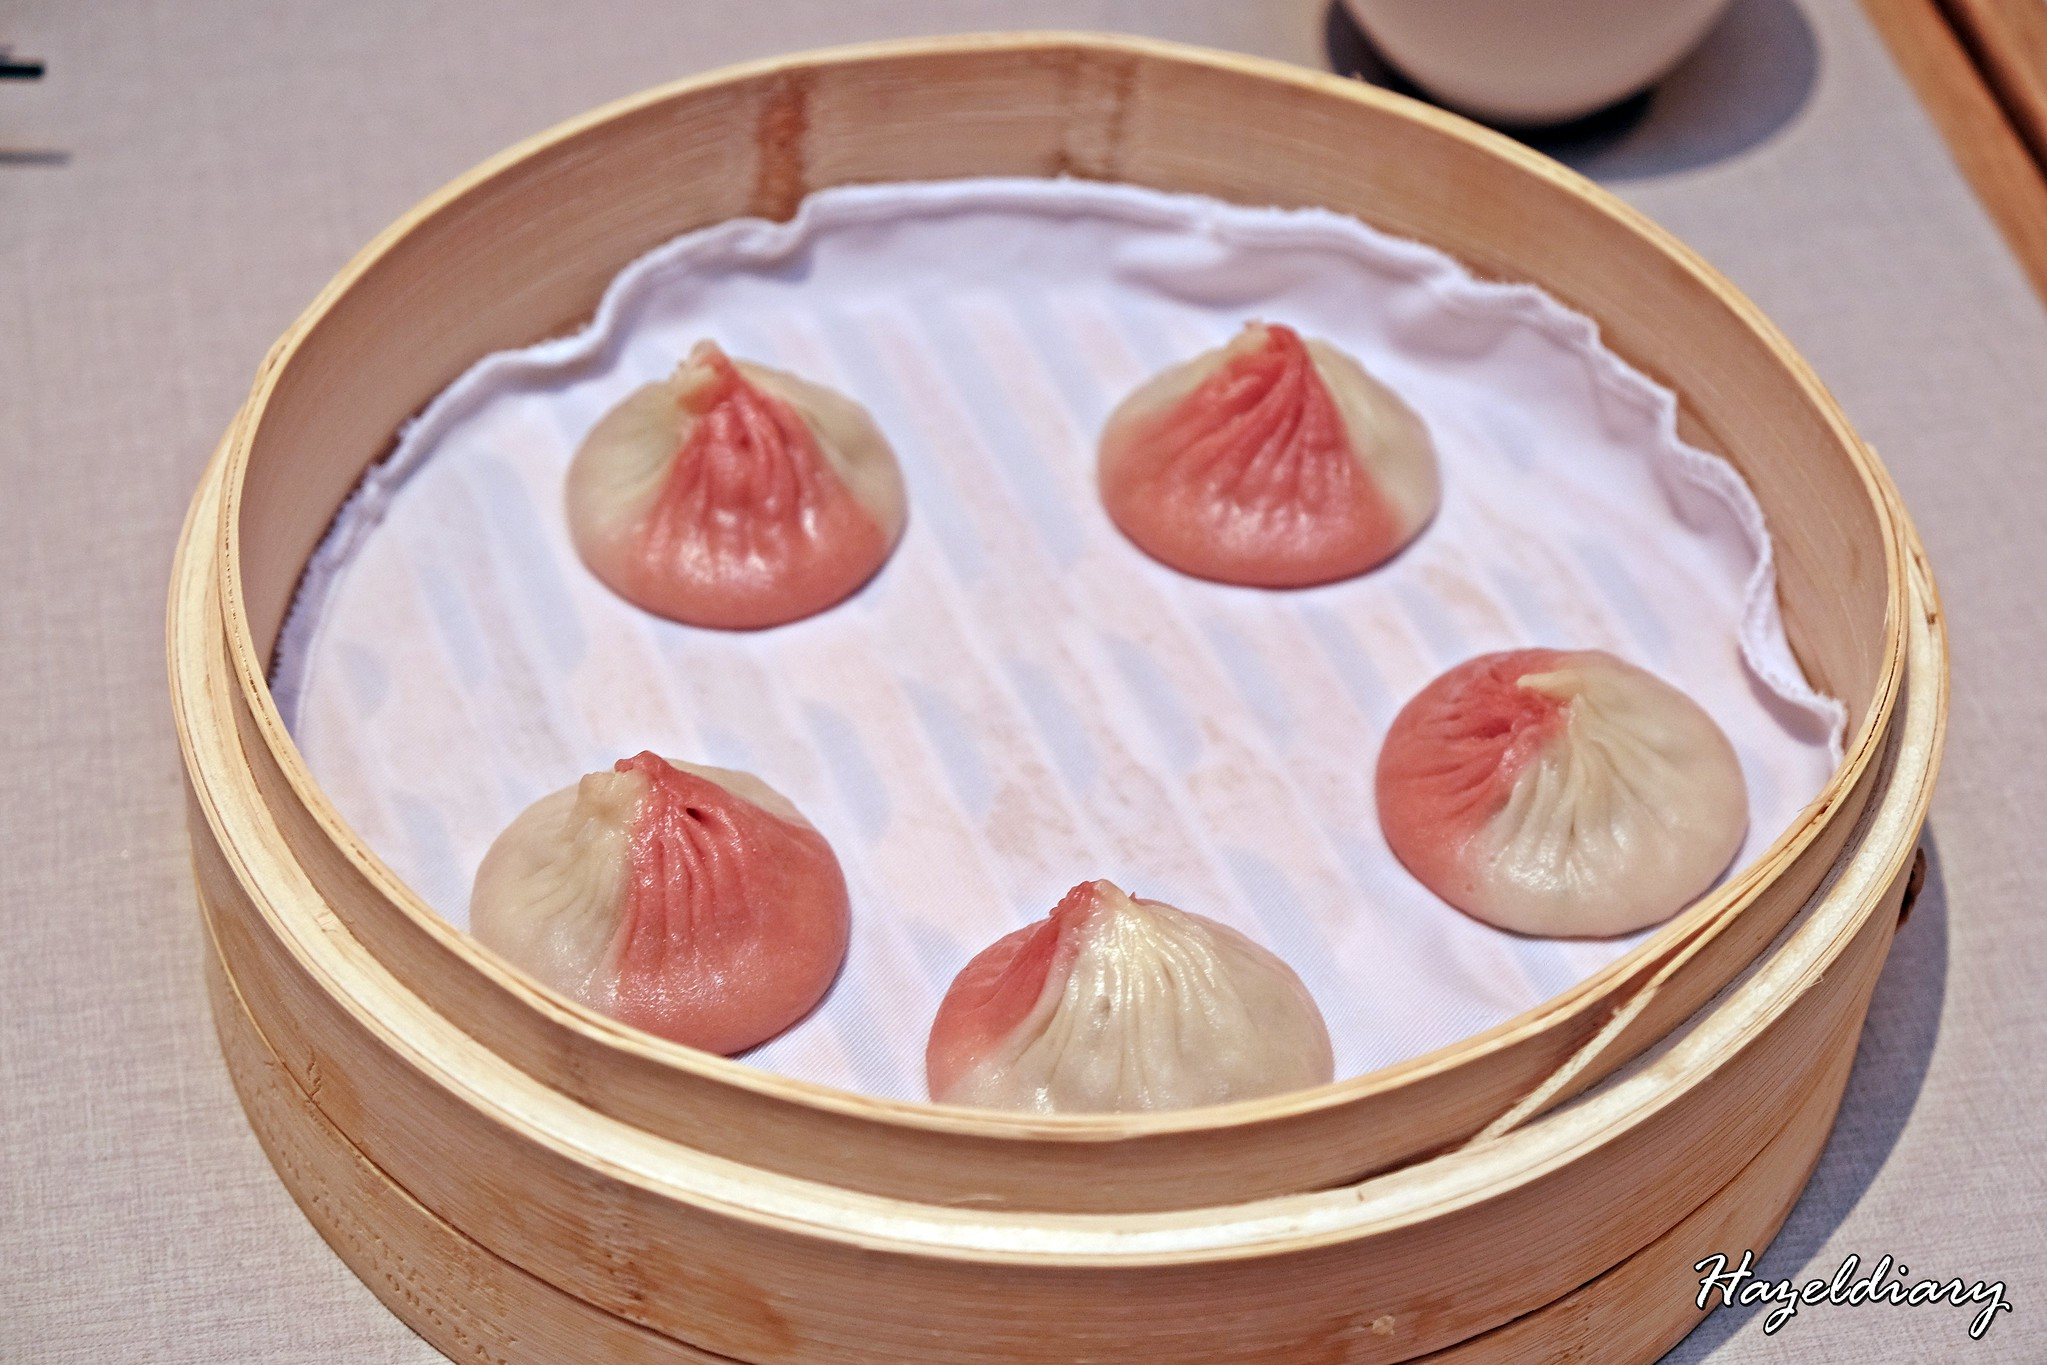 Paradise Dynasty-Wisma Atria-Beauty Collagen Xiao Long Bao